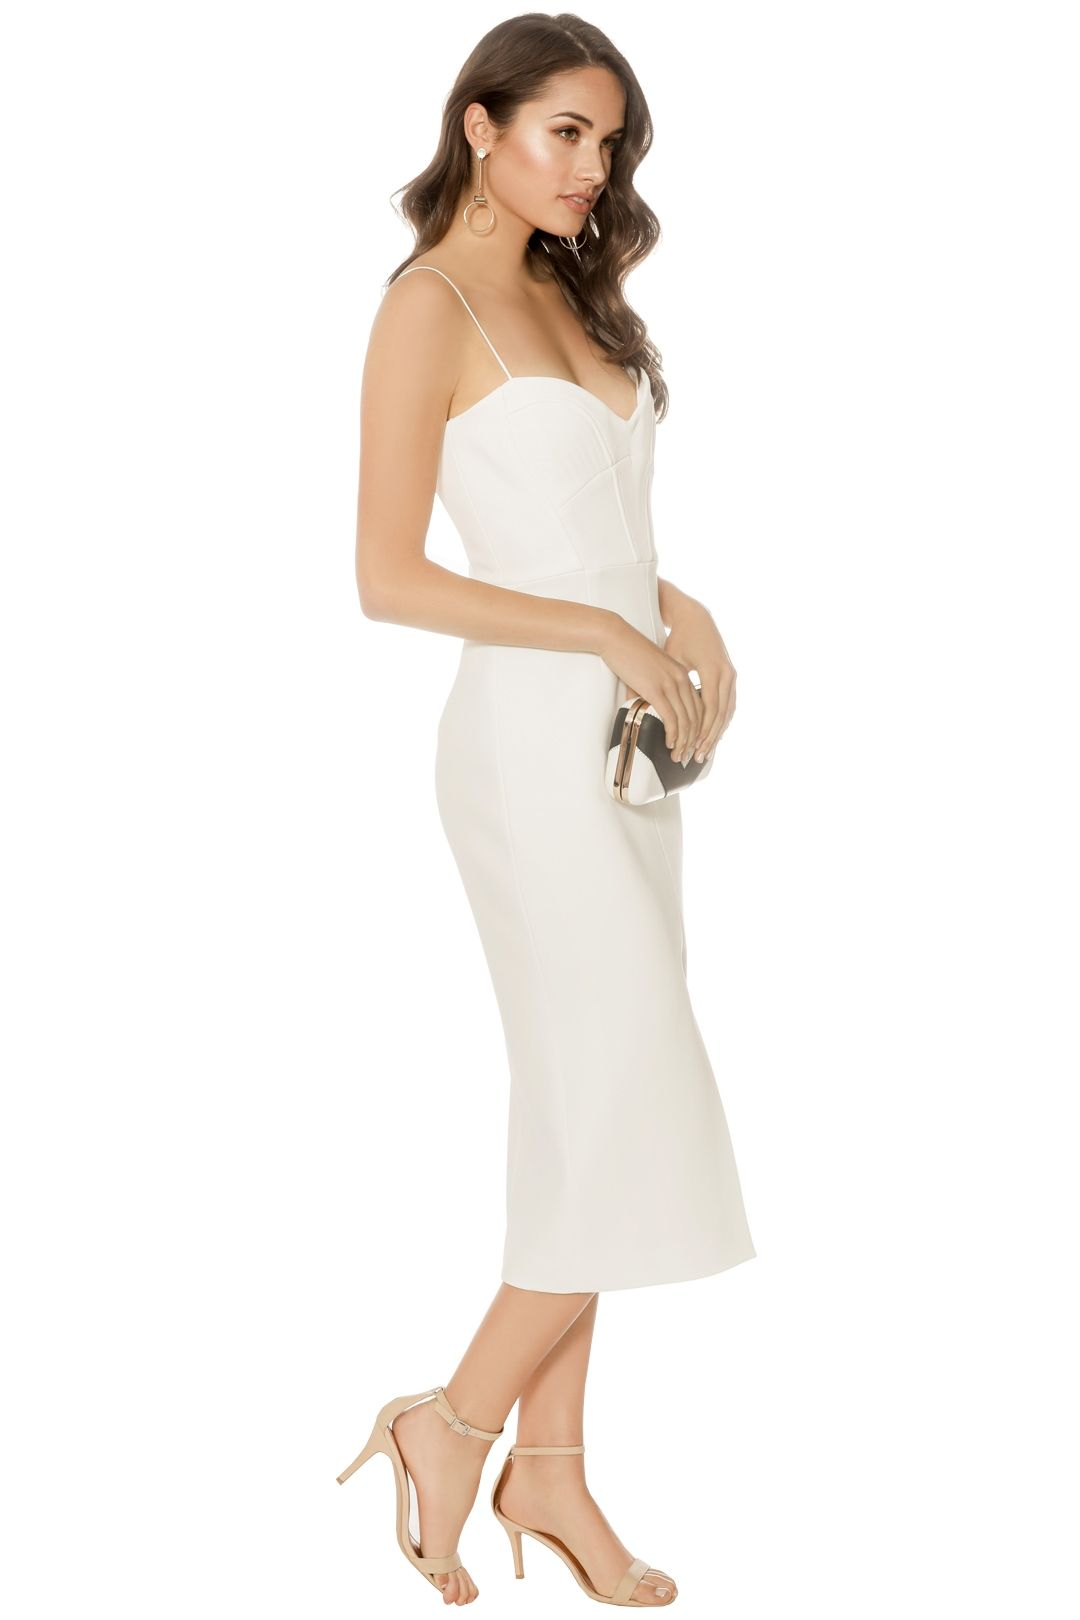 Nicholas - Bandage Quilted Midi Dress - Ivory - Side